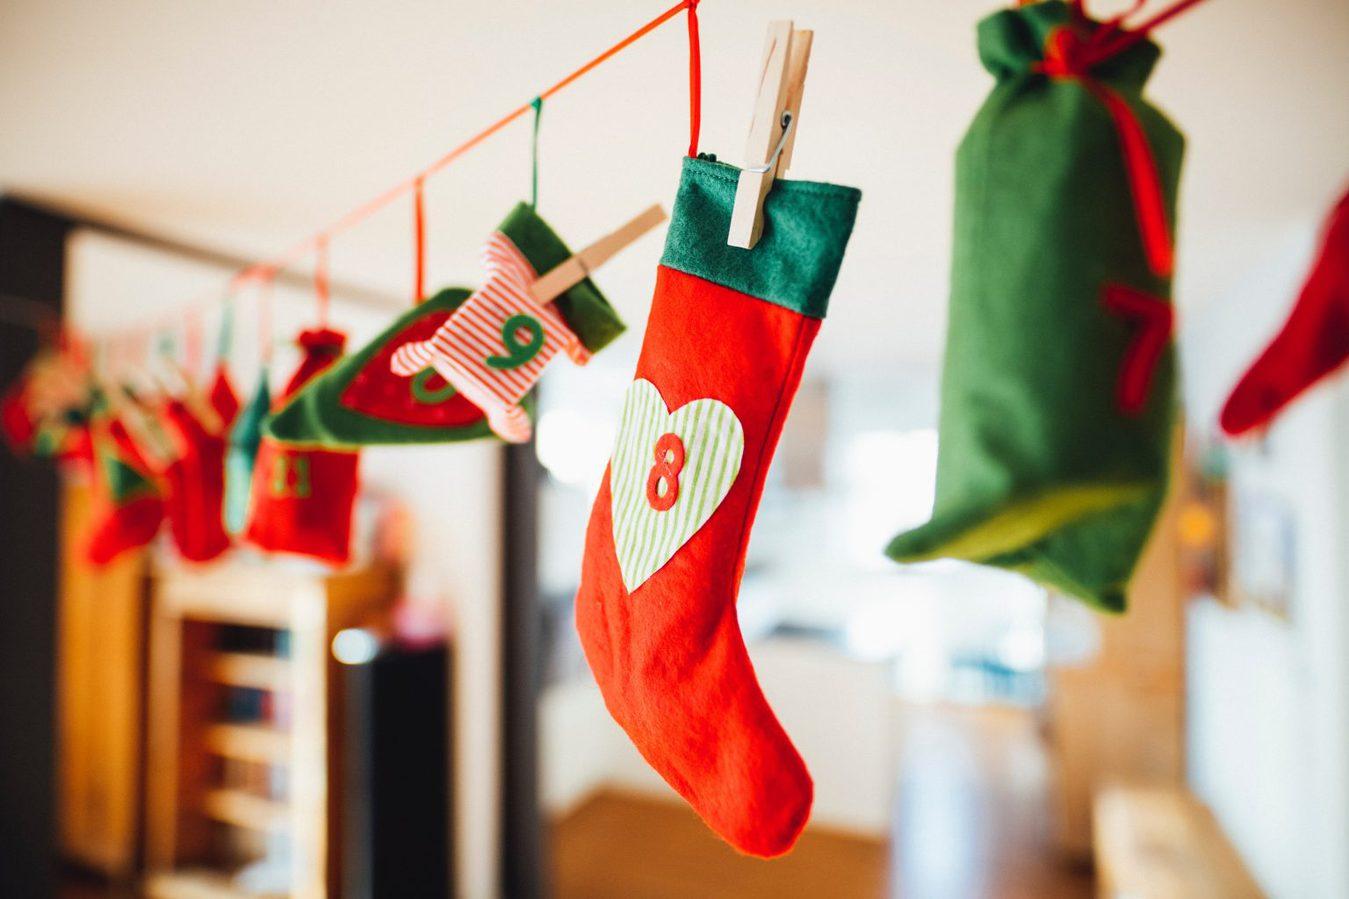 Christmas countdown stockings